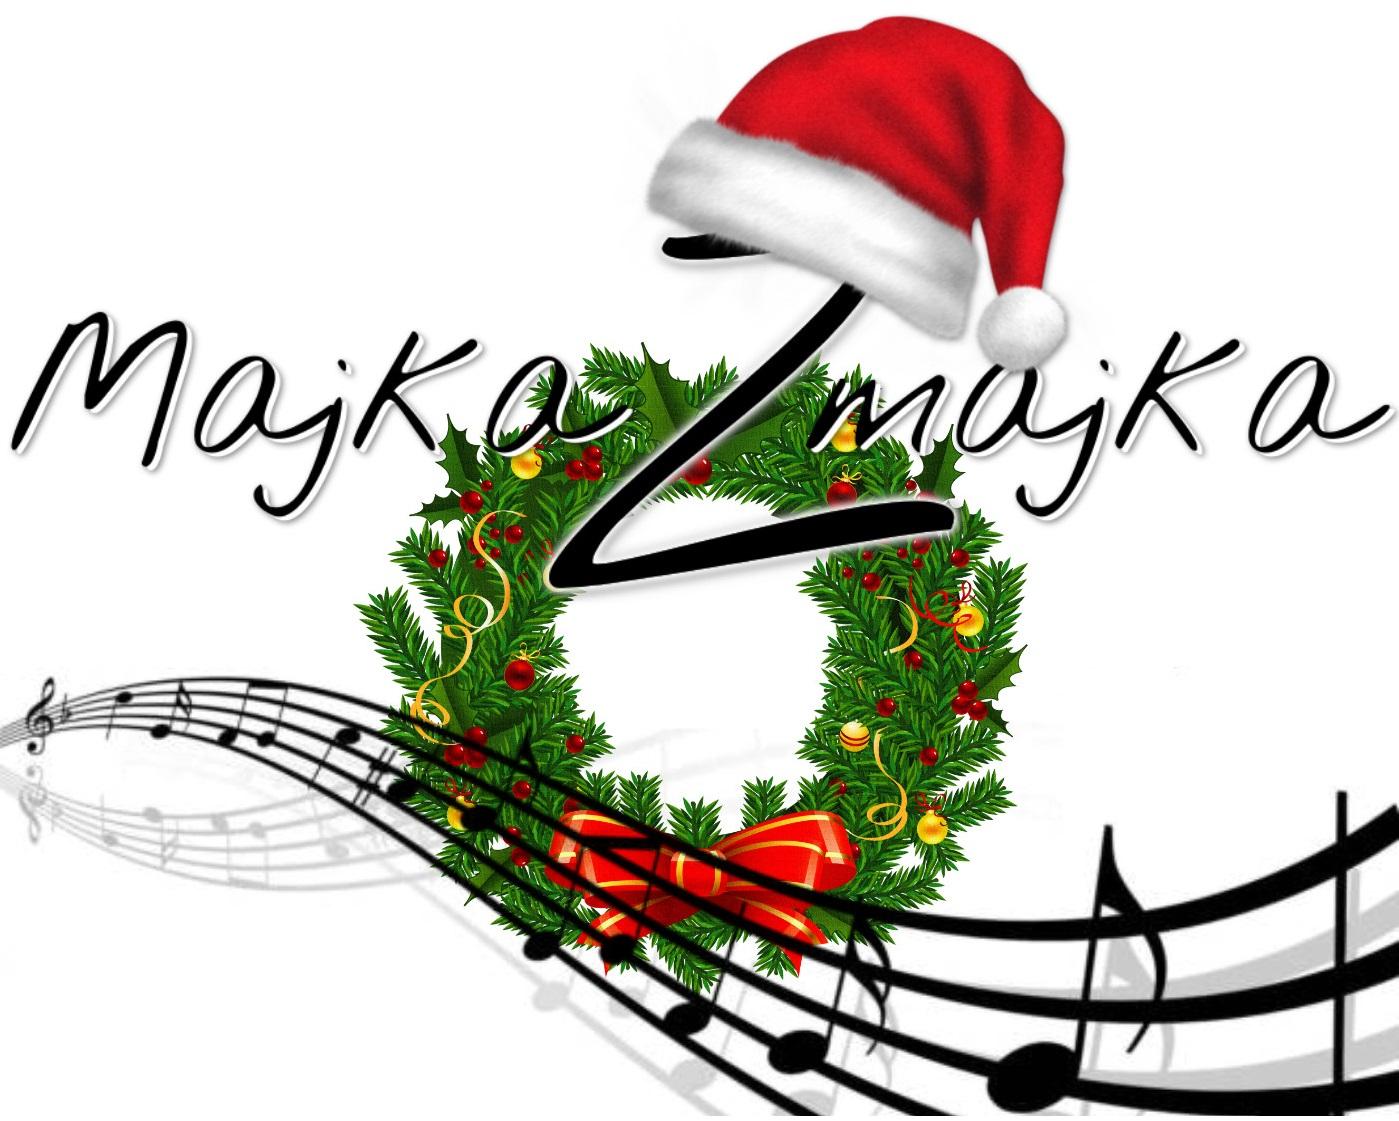 Zmajka's top 10 Christmas Songs 2018